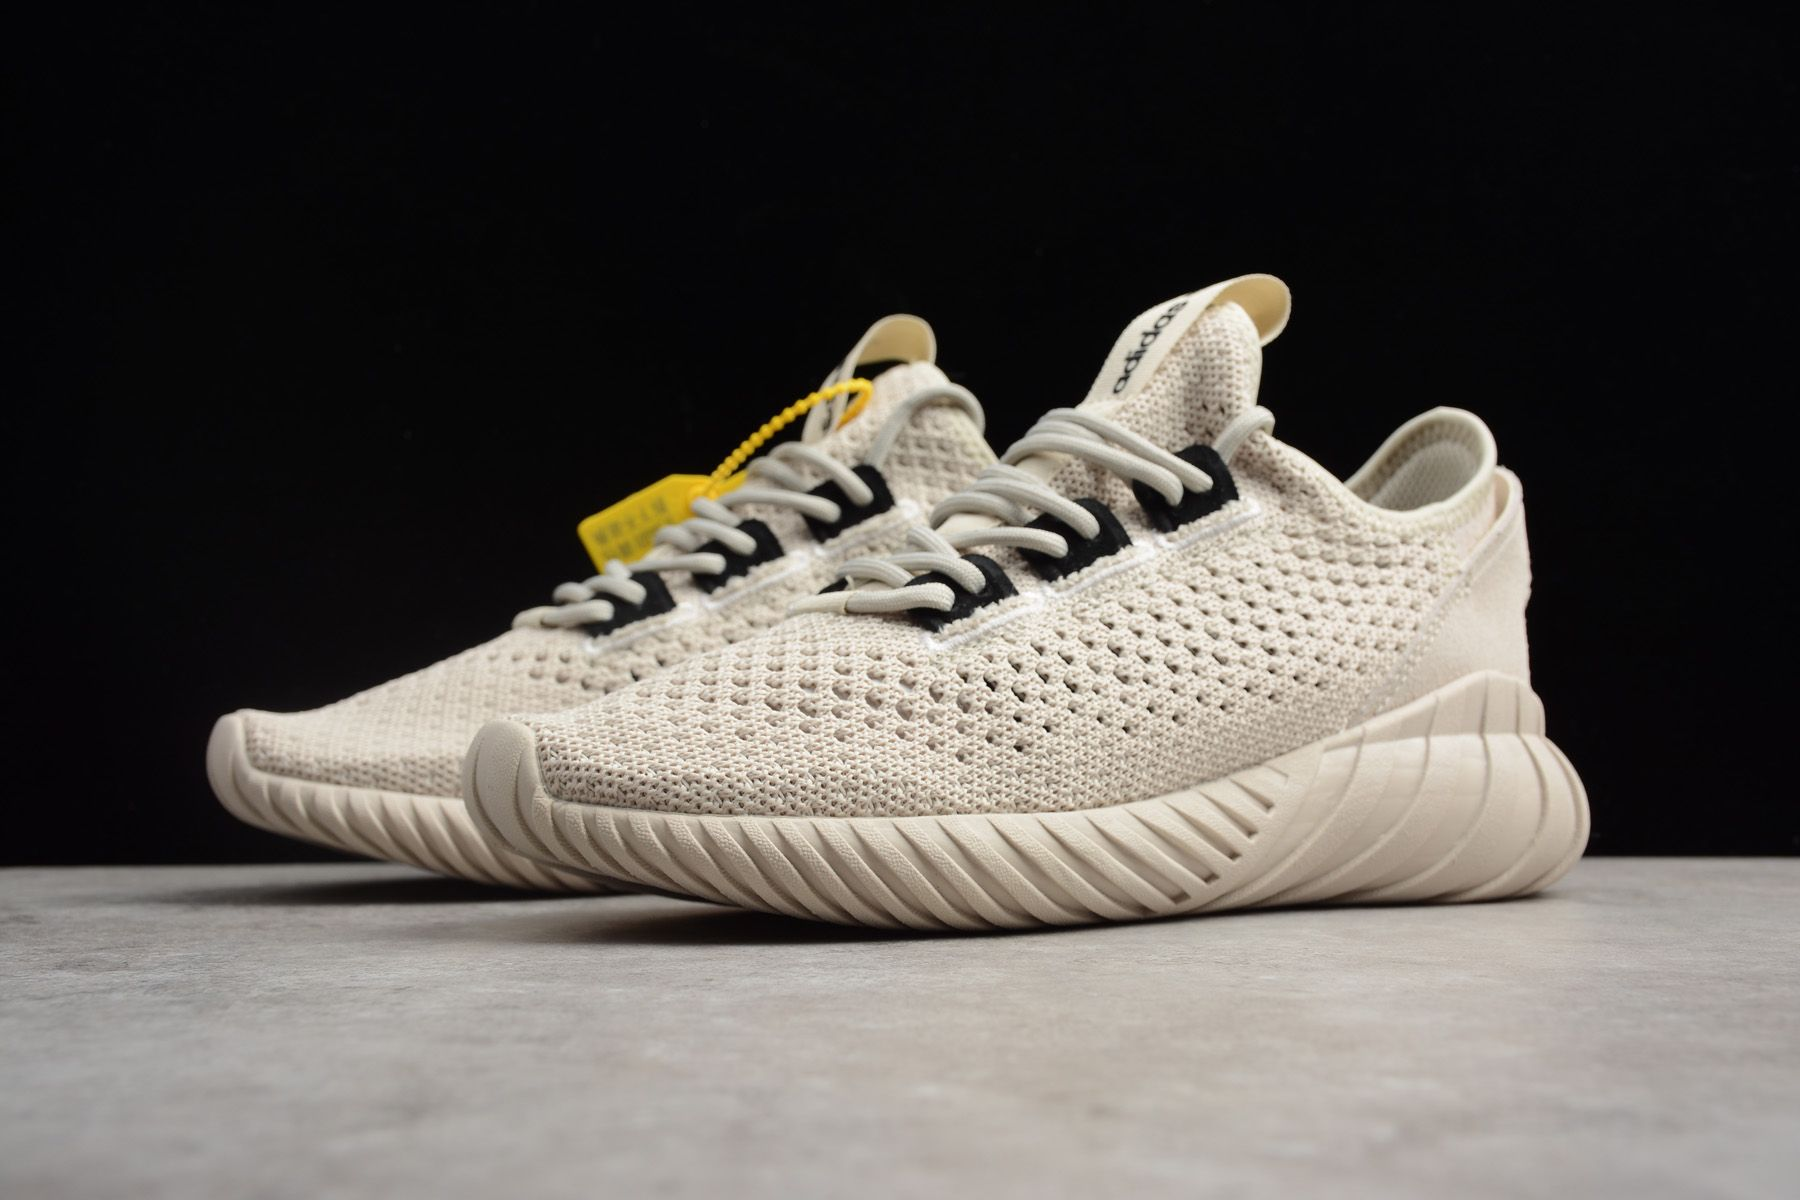 adidas cg5510 Shop Clothing \u0026 Shoes Online